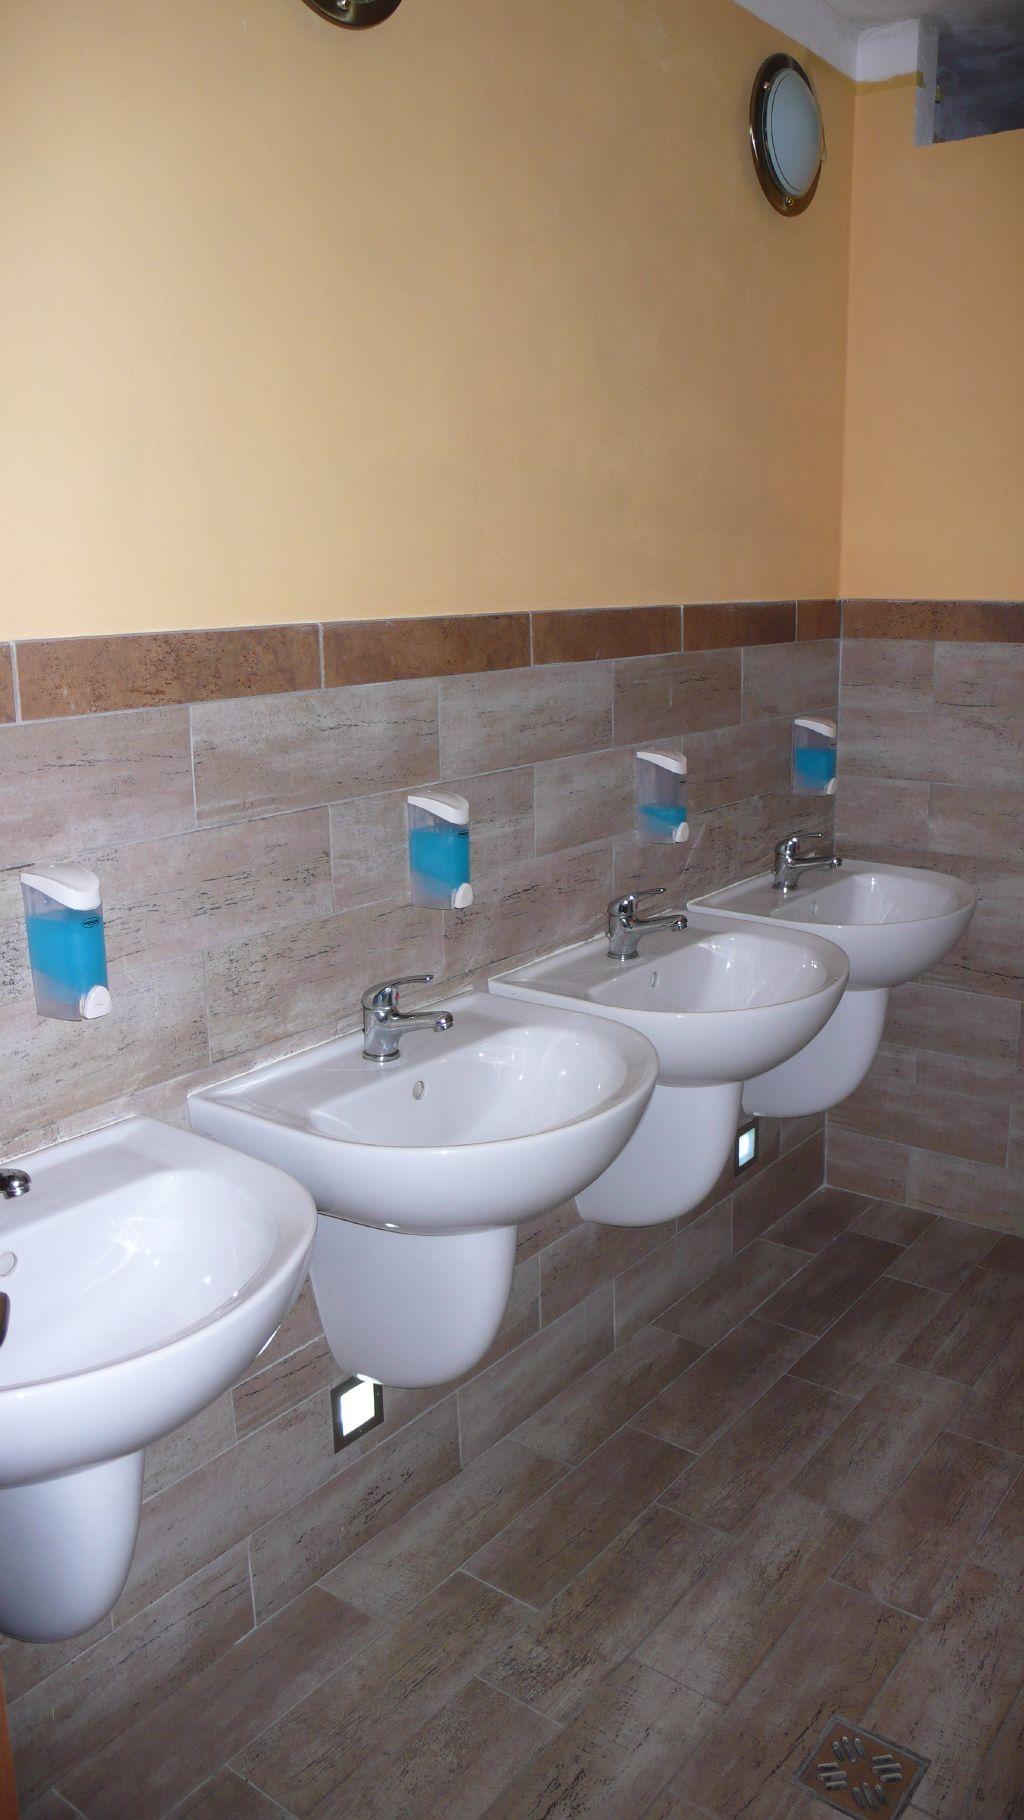 umývárny welness